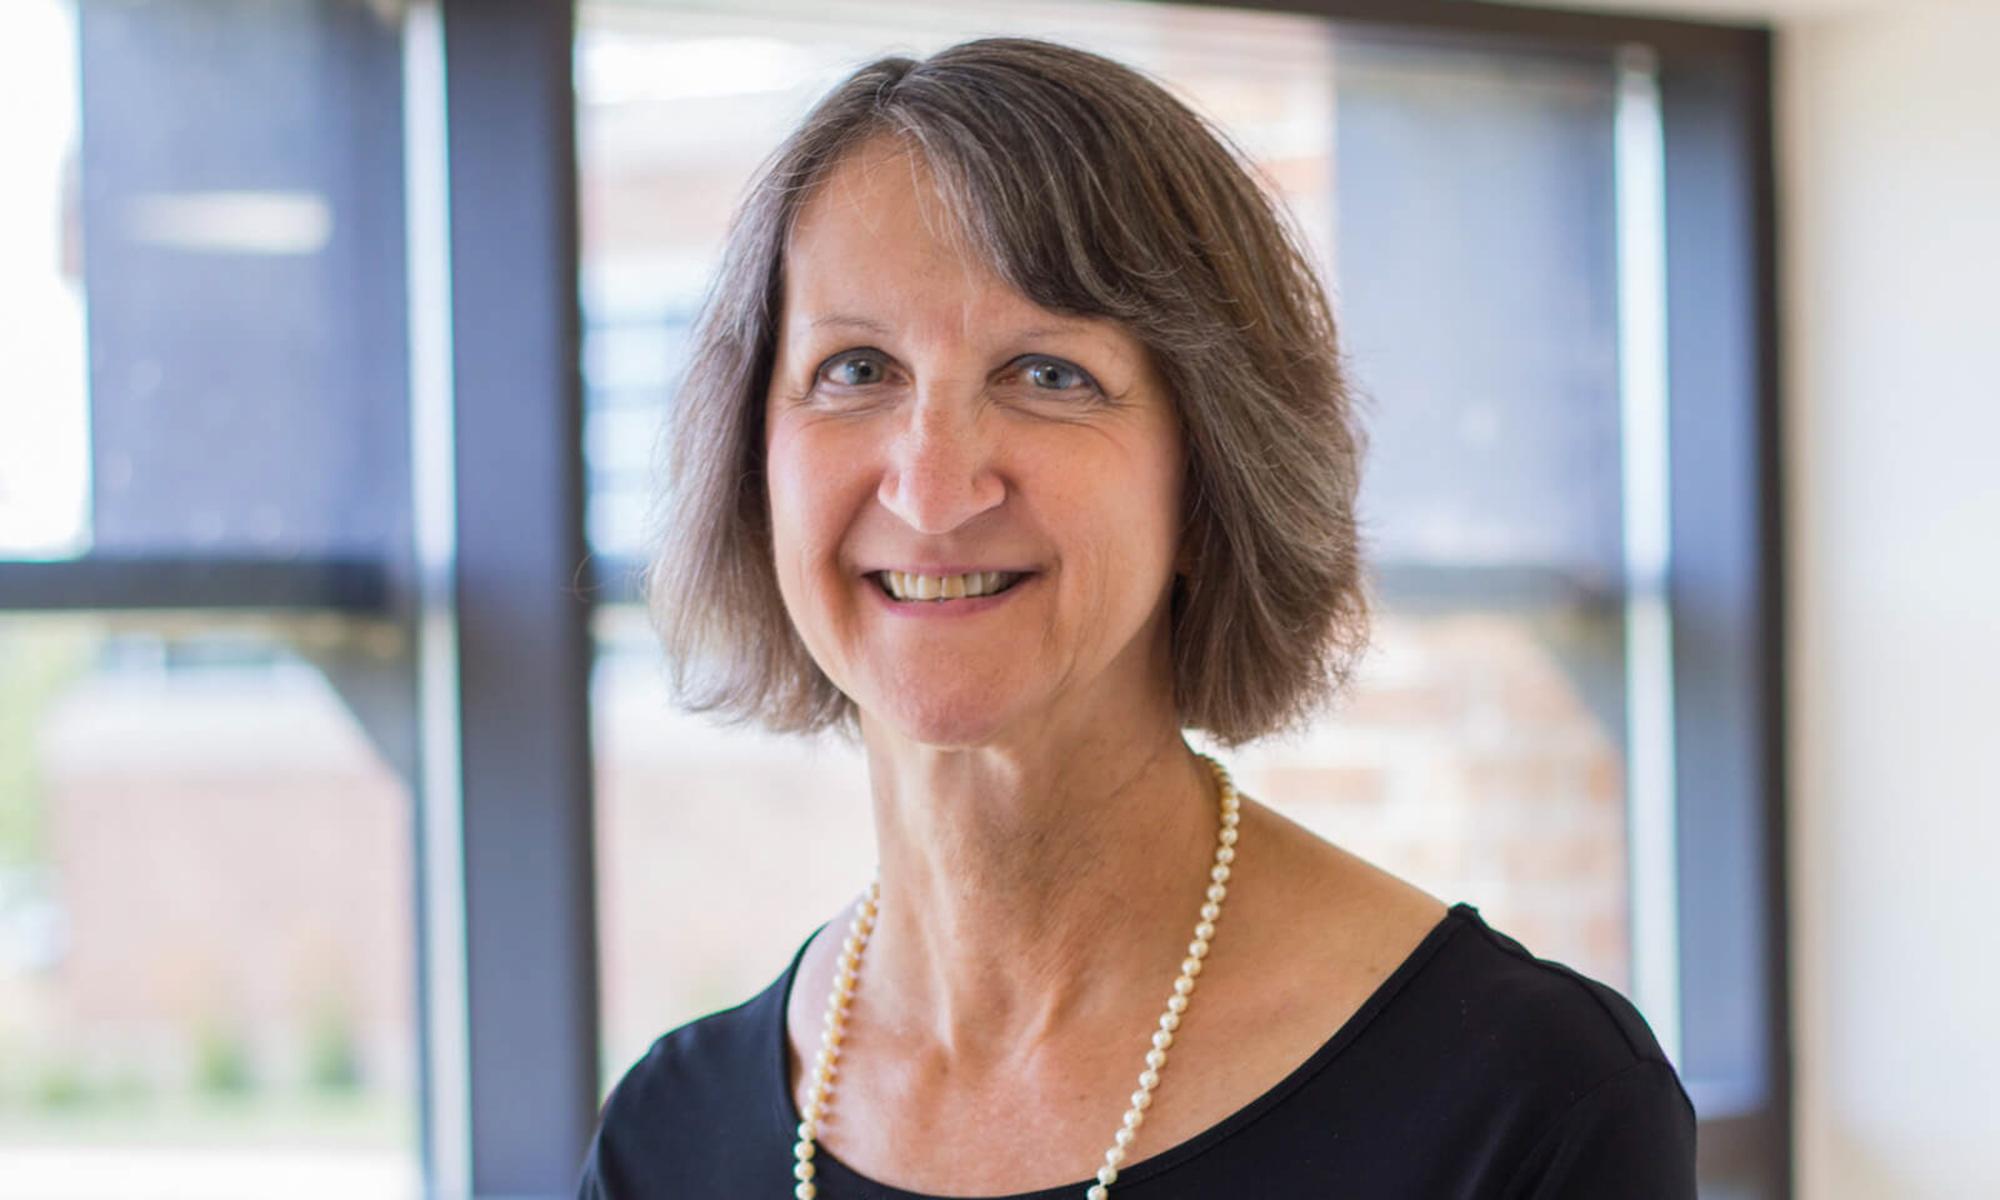 Dr. Sharon Chappy